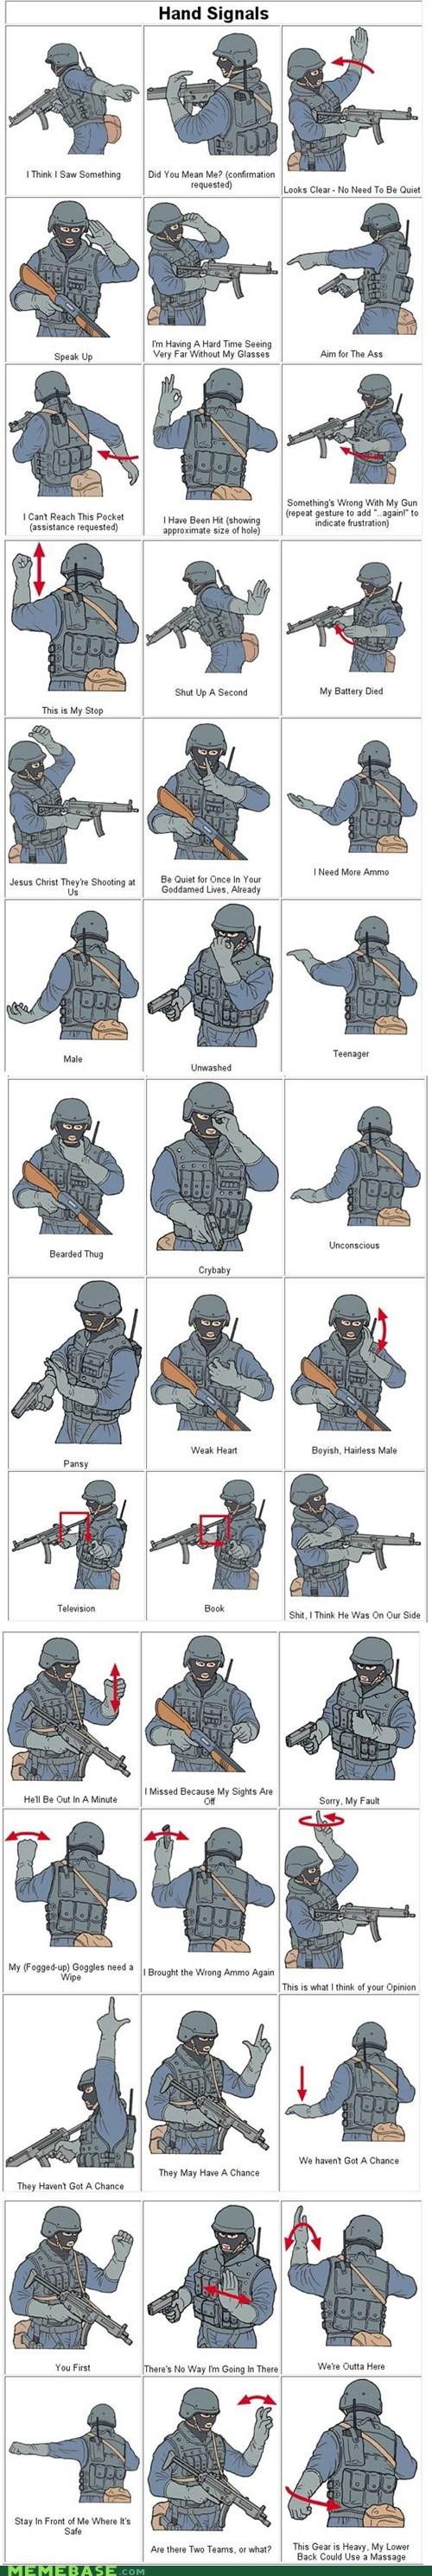 hand signals,Memes,swat,swat team